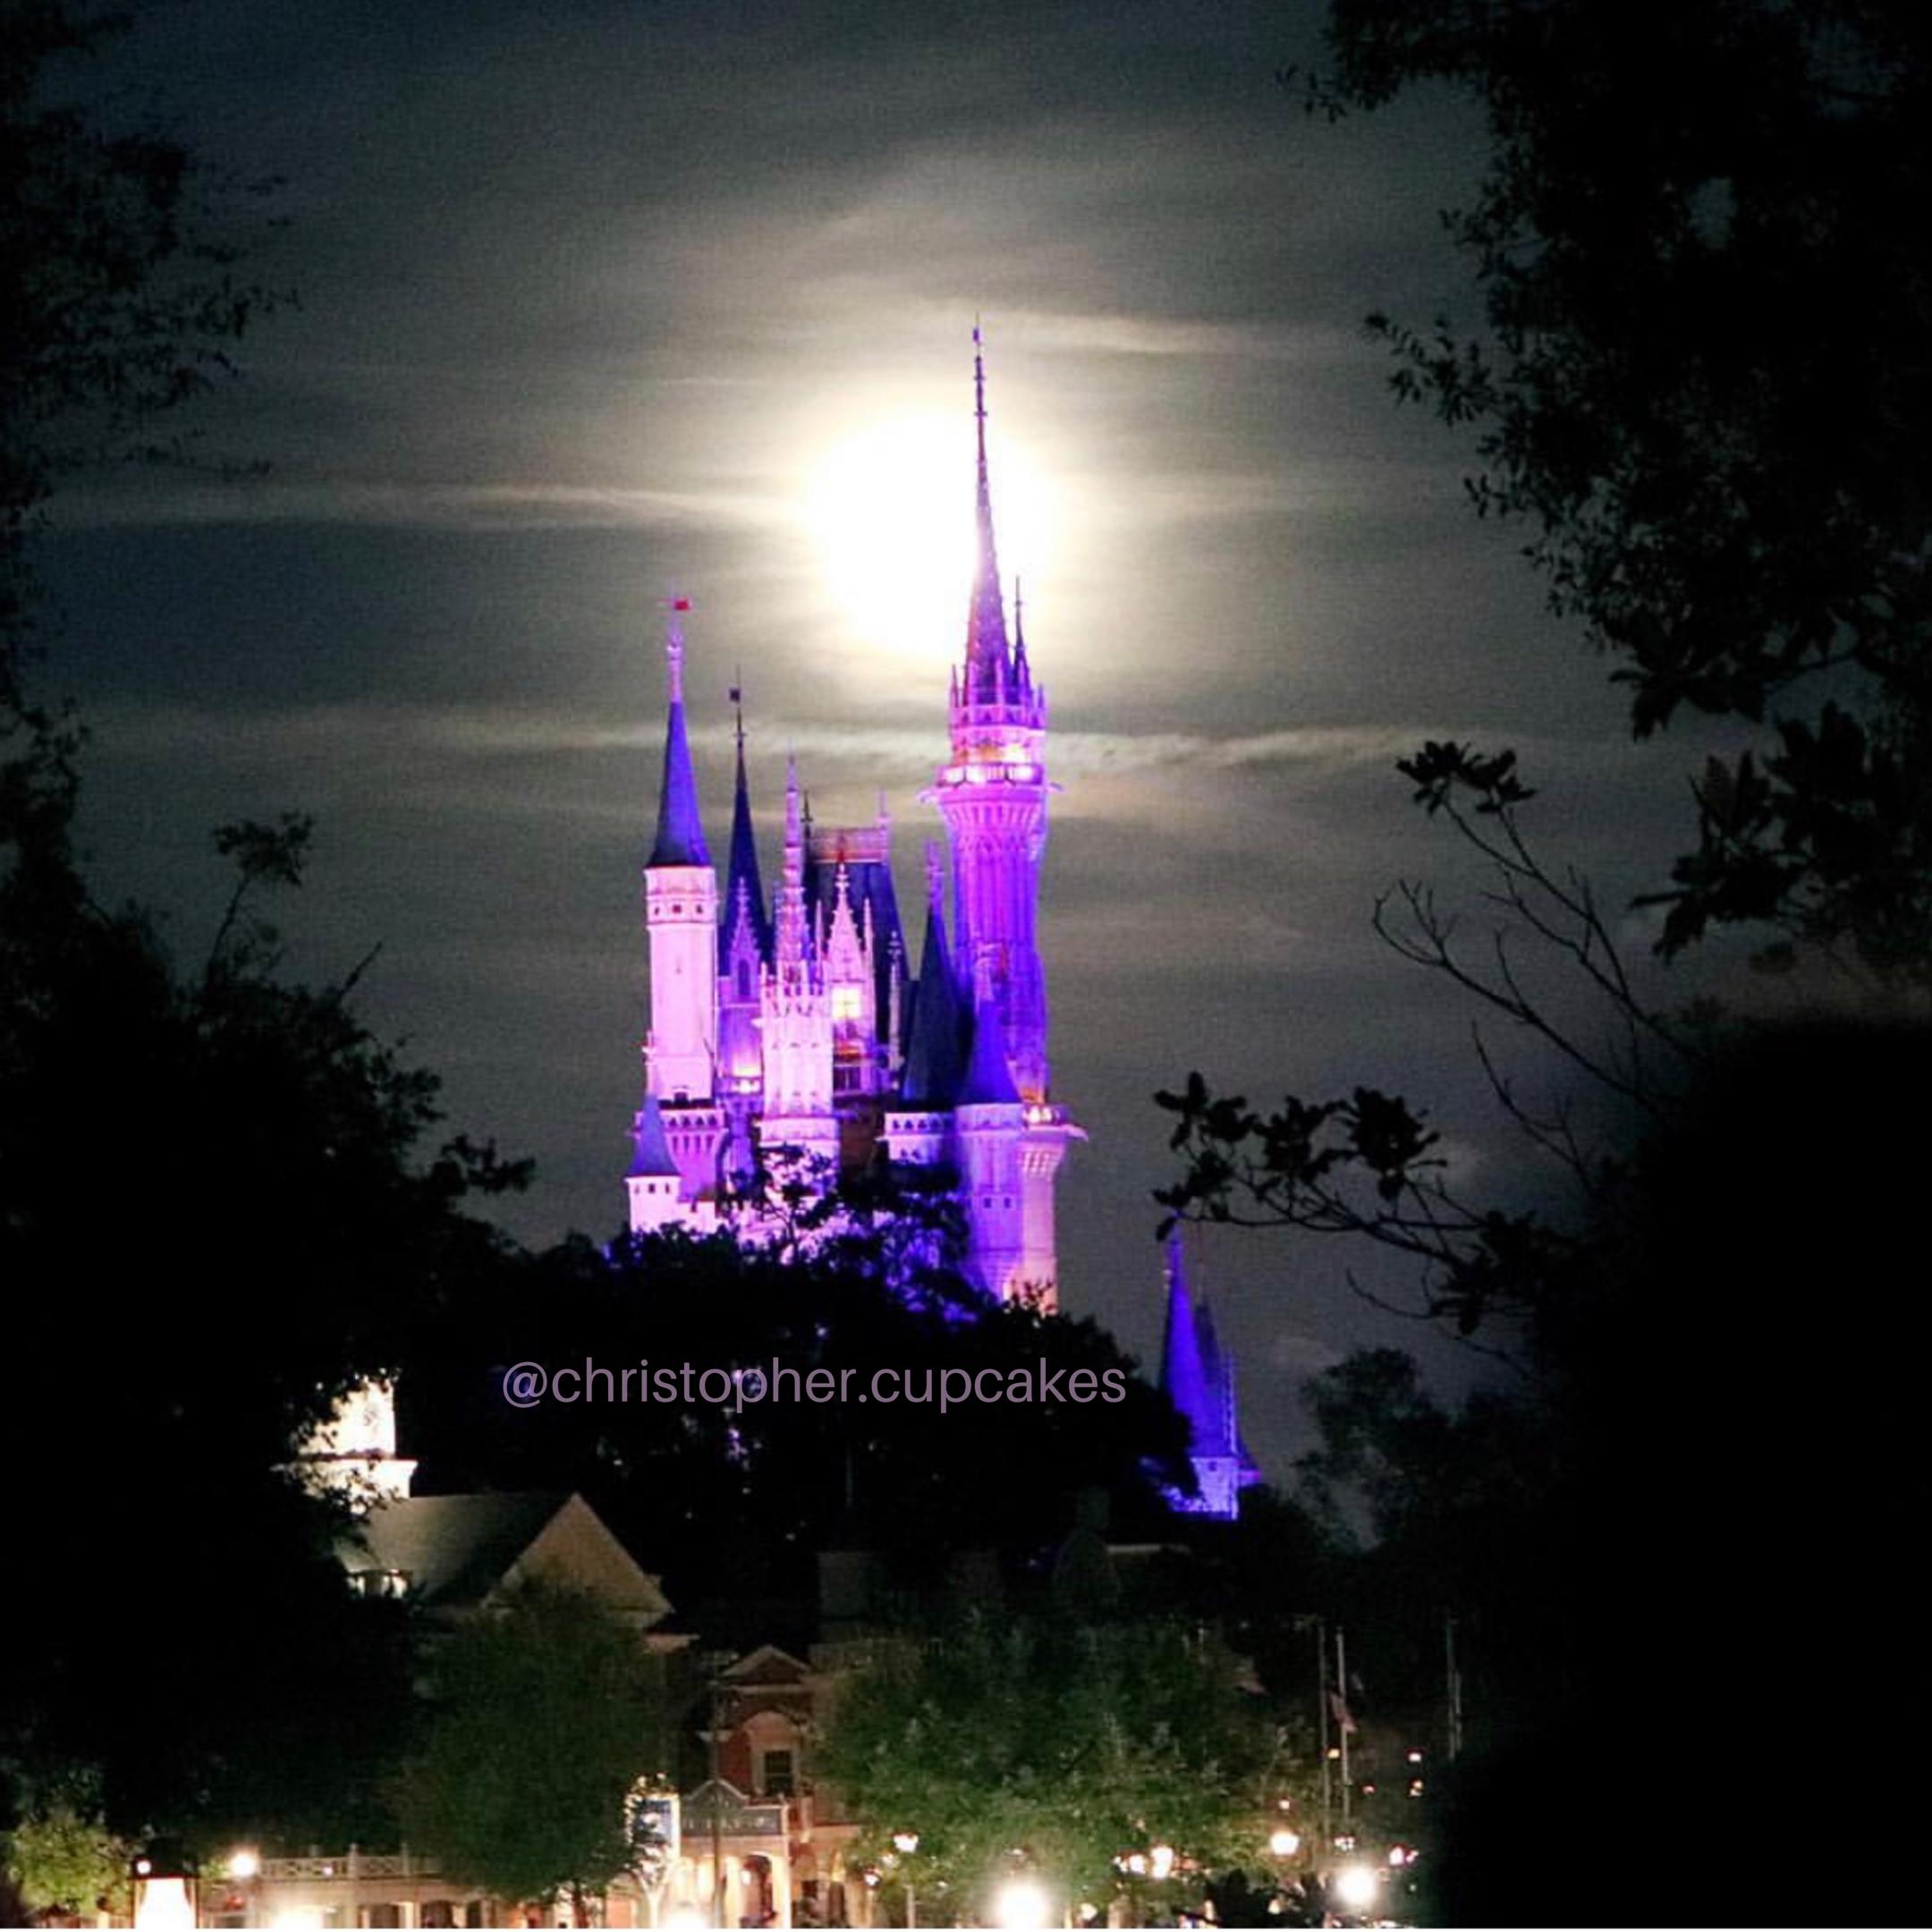 Disney walls, Disney Instagram, Disney photo spots, best Disney photos, Disney instagramable, Disney instagrammable, Disney purple wall,